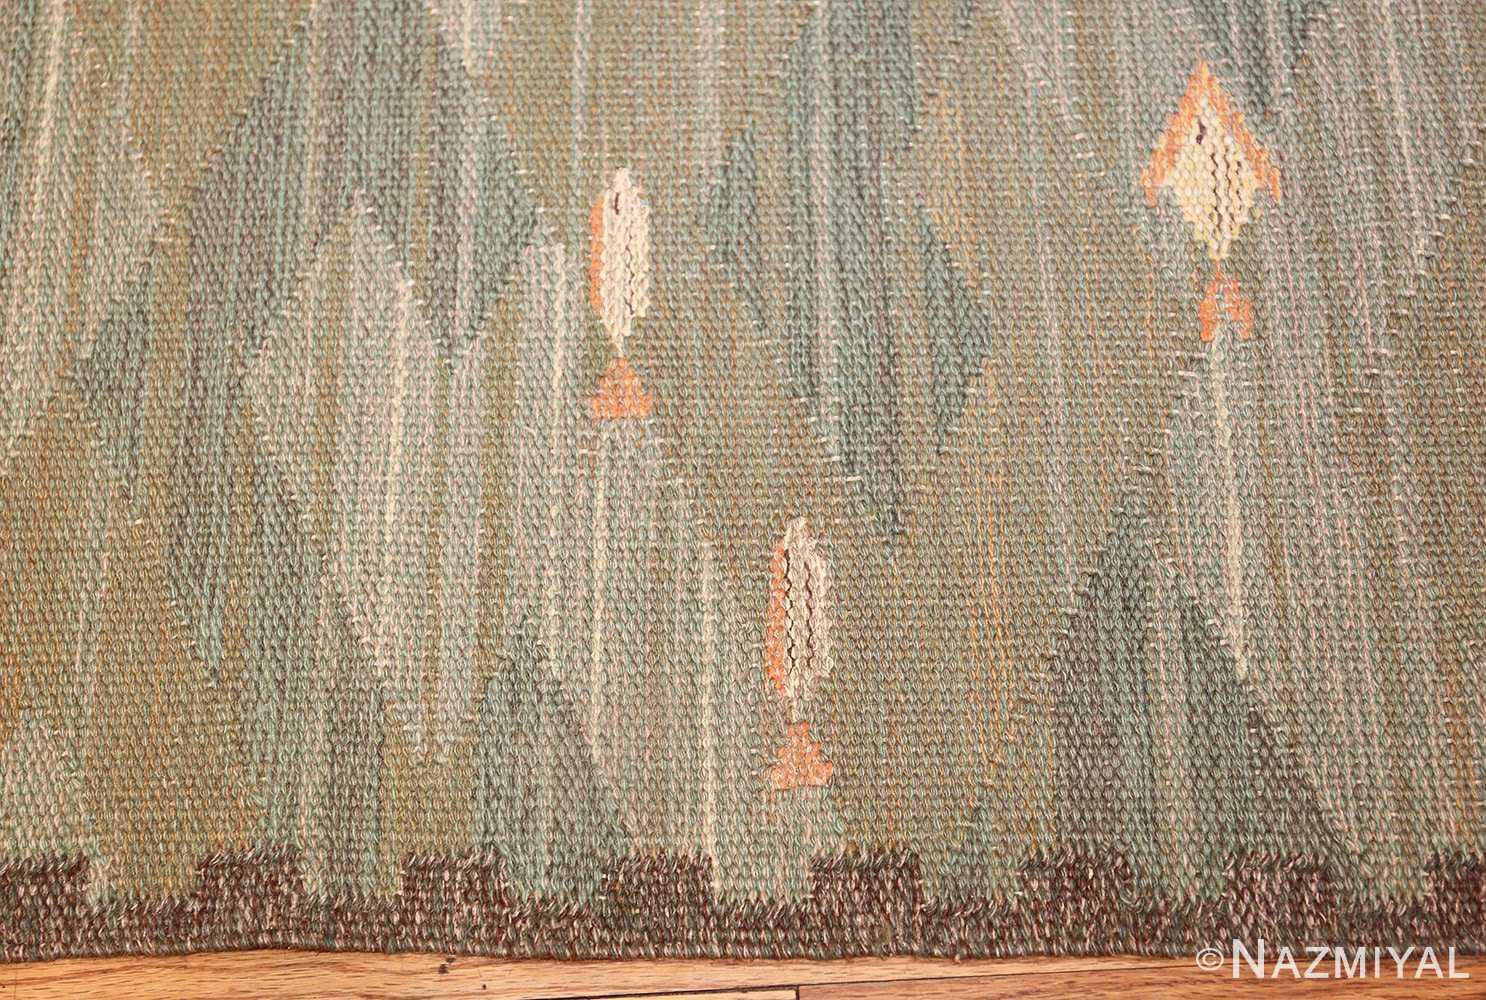 vintage scandinavian rug possibly by elsa gullberg 49504 border Nazmiyal